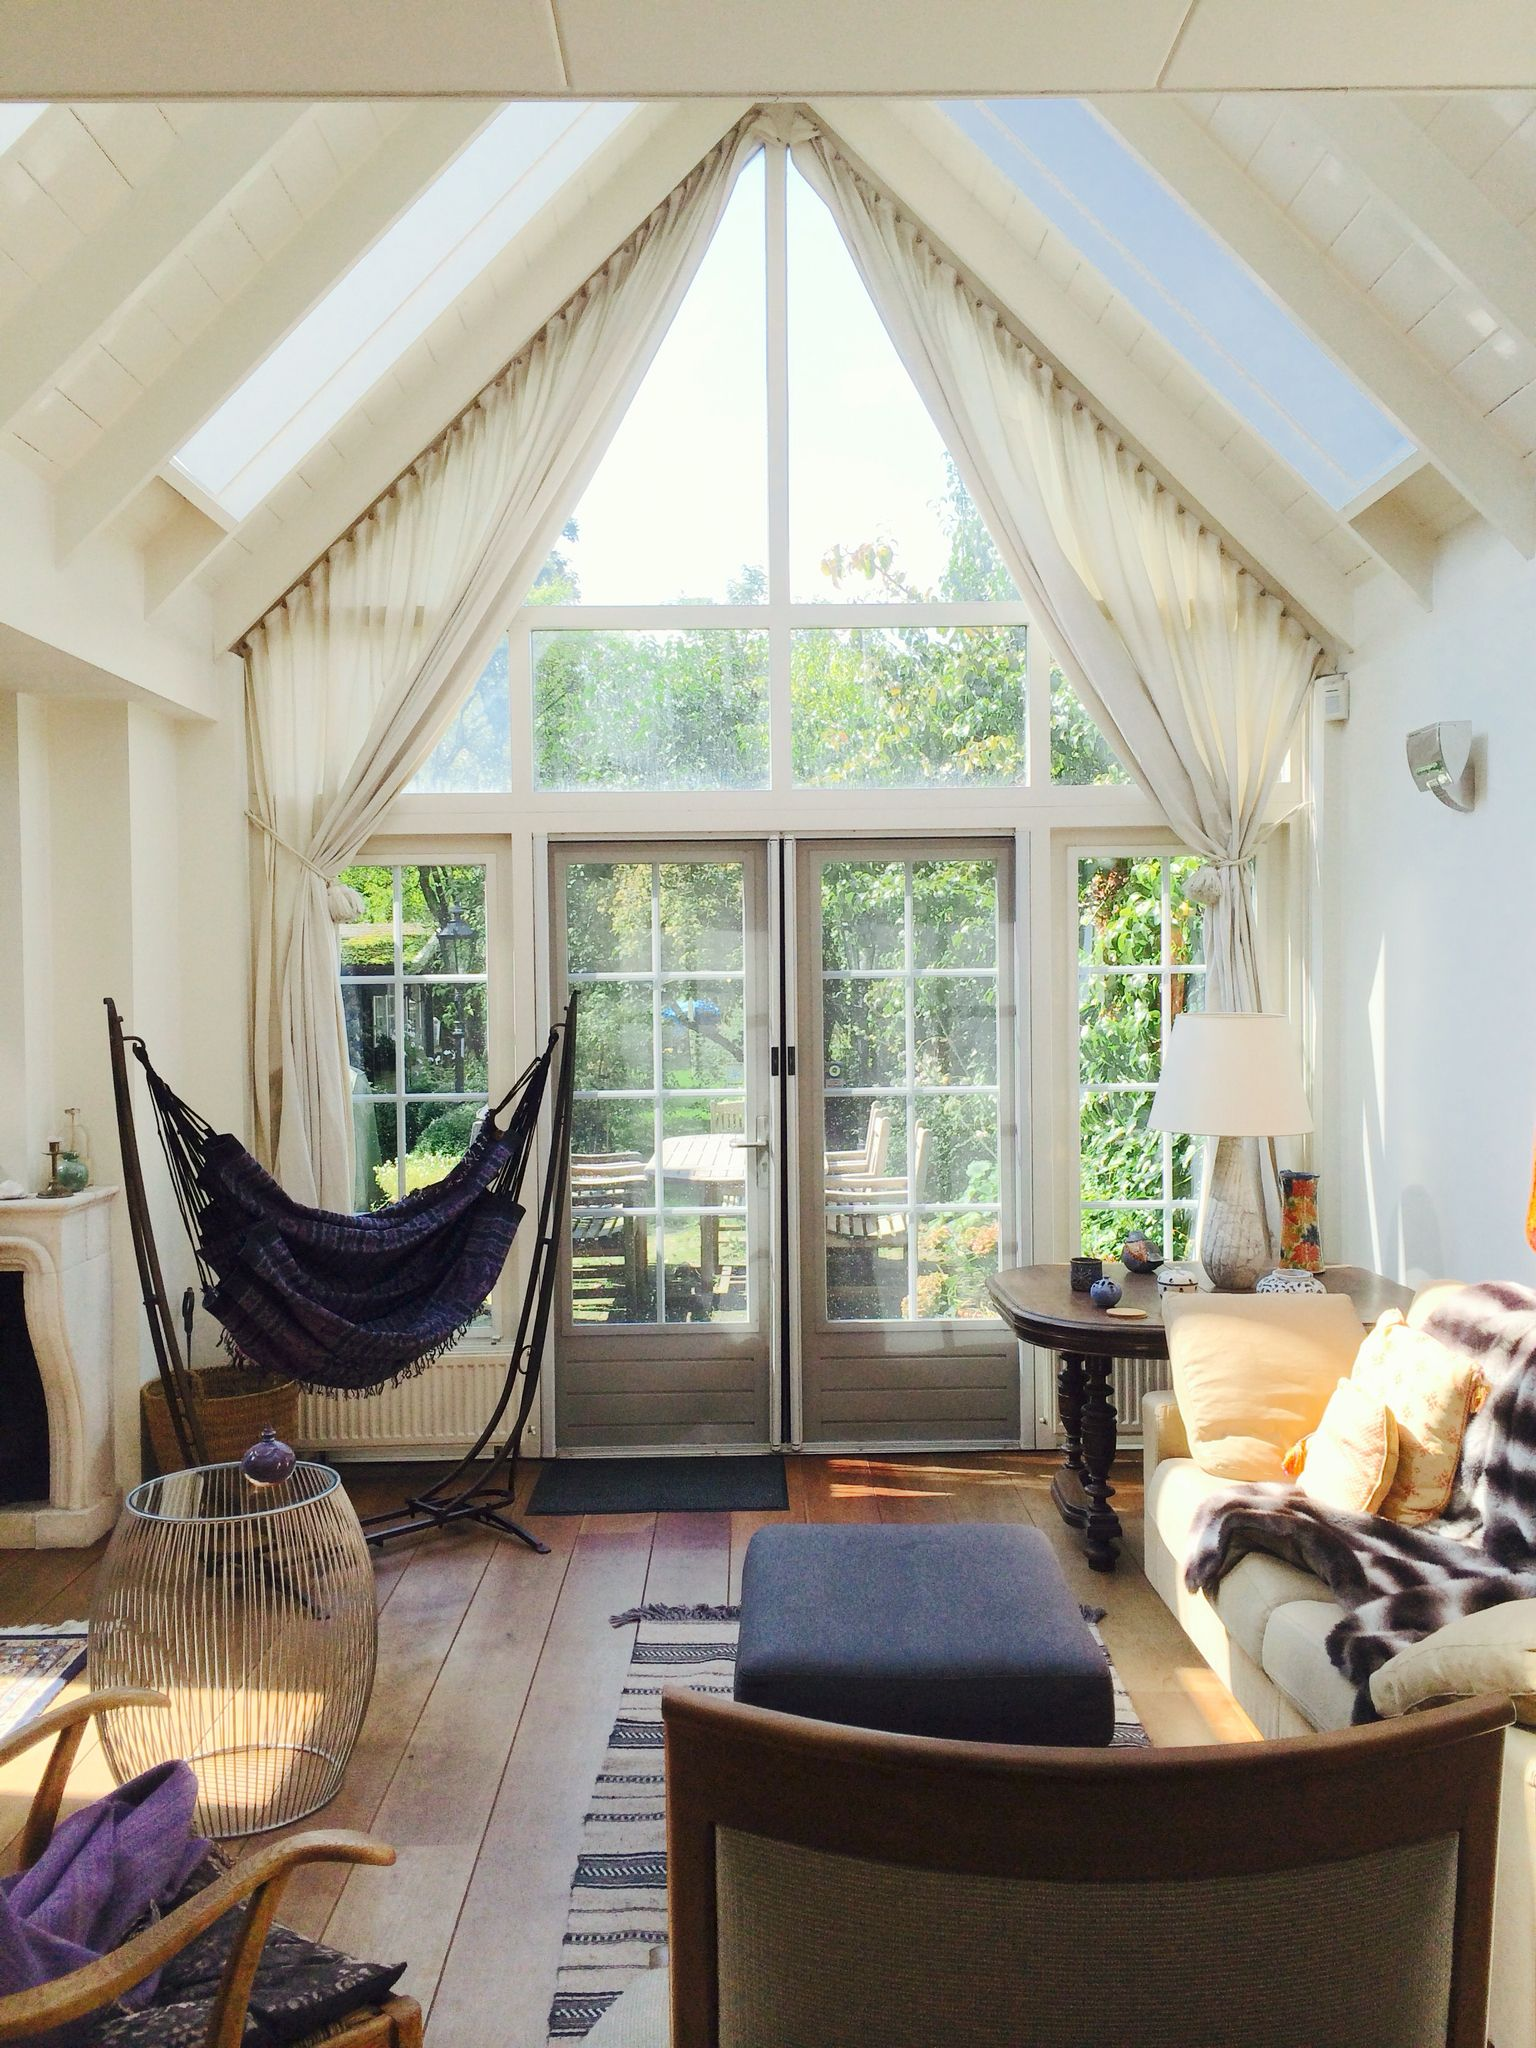 from fresh apollo cmsmercury box chair milky com garden of hammock room beautiful living